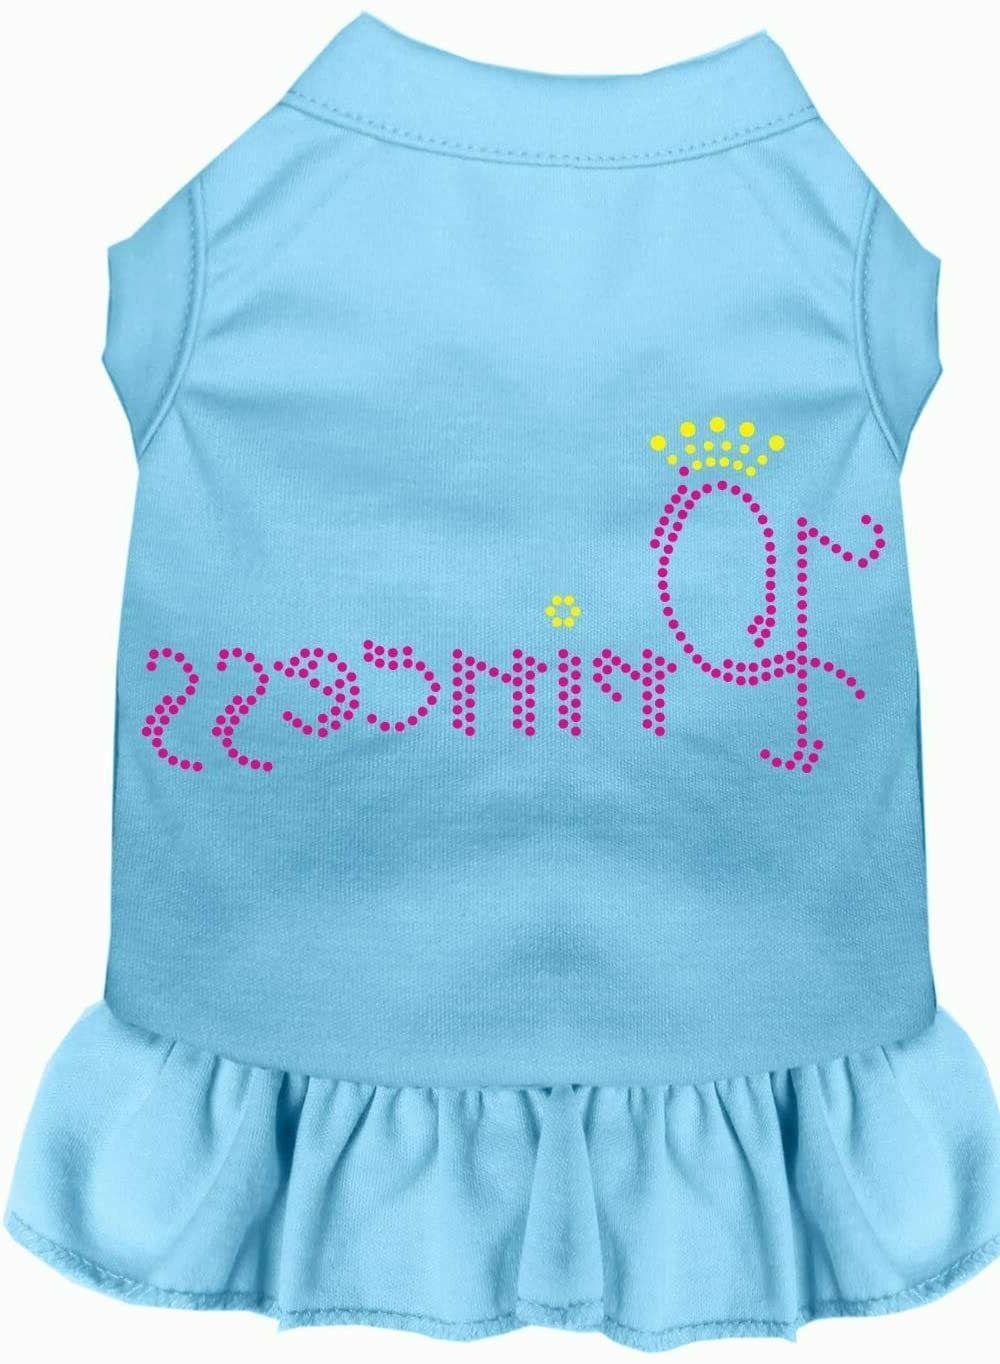 Princess Rhinestone Dress-By Pet--Assorted